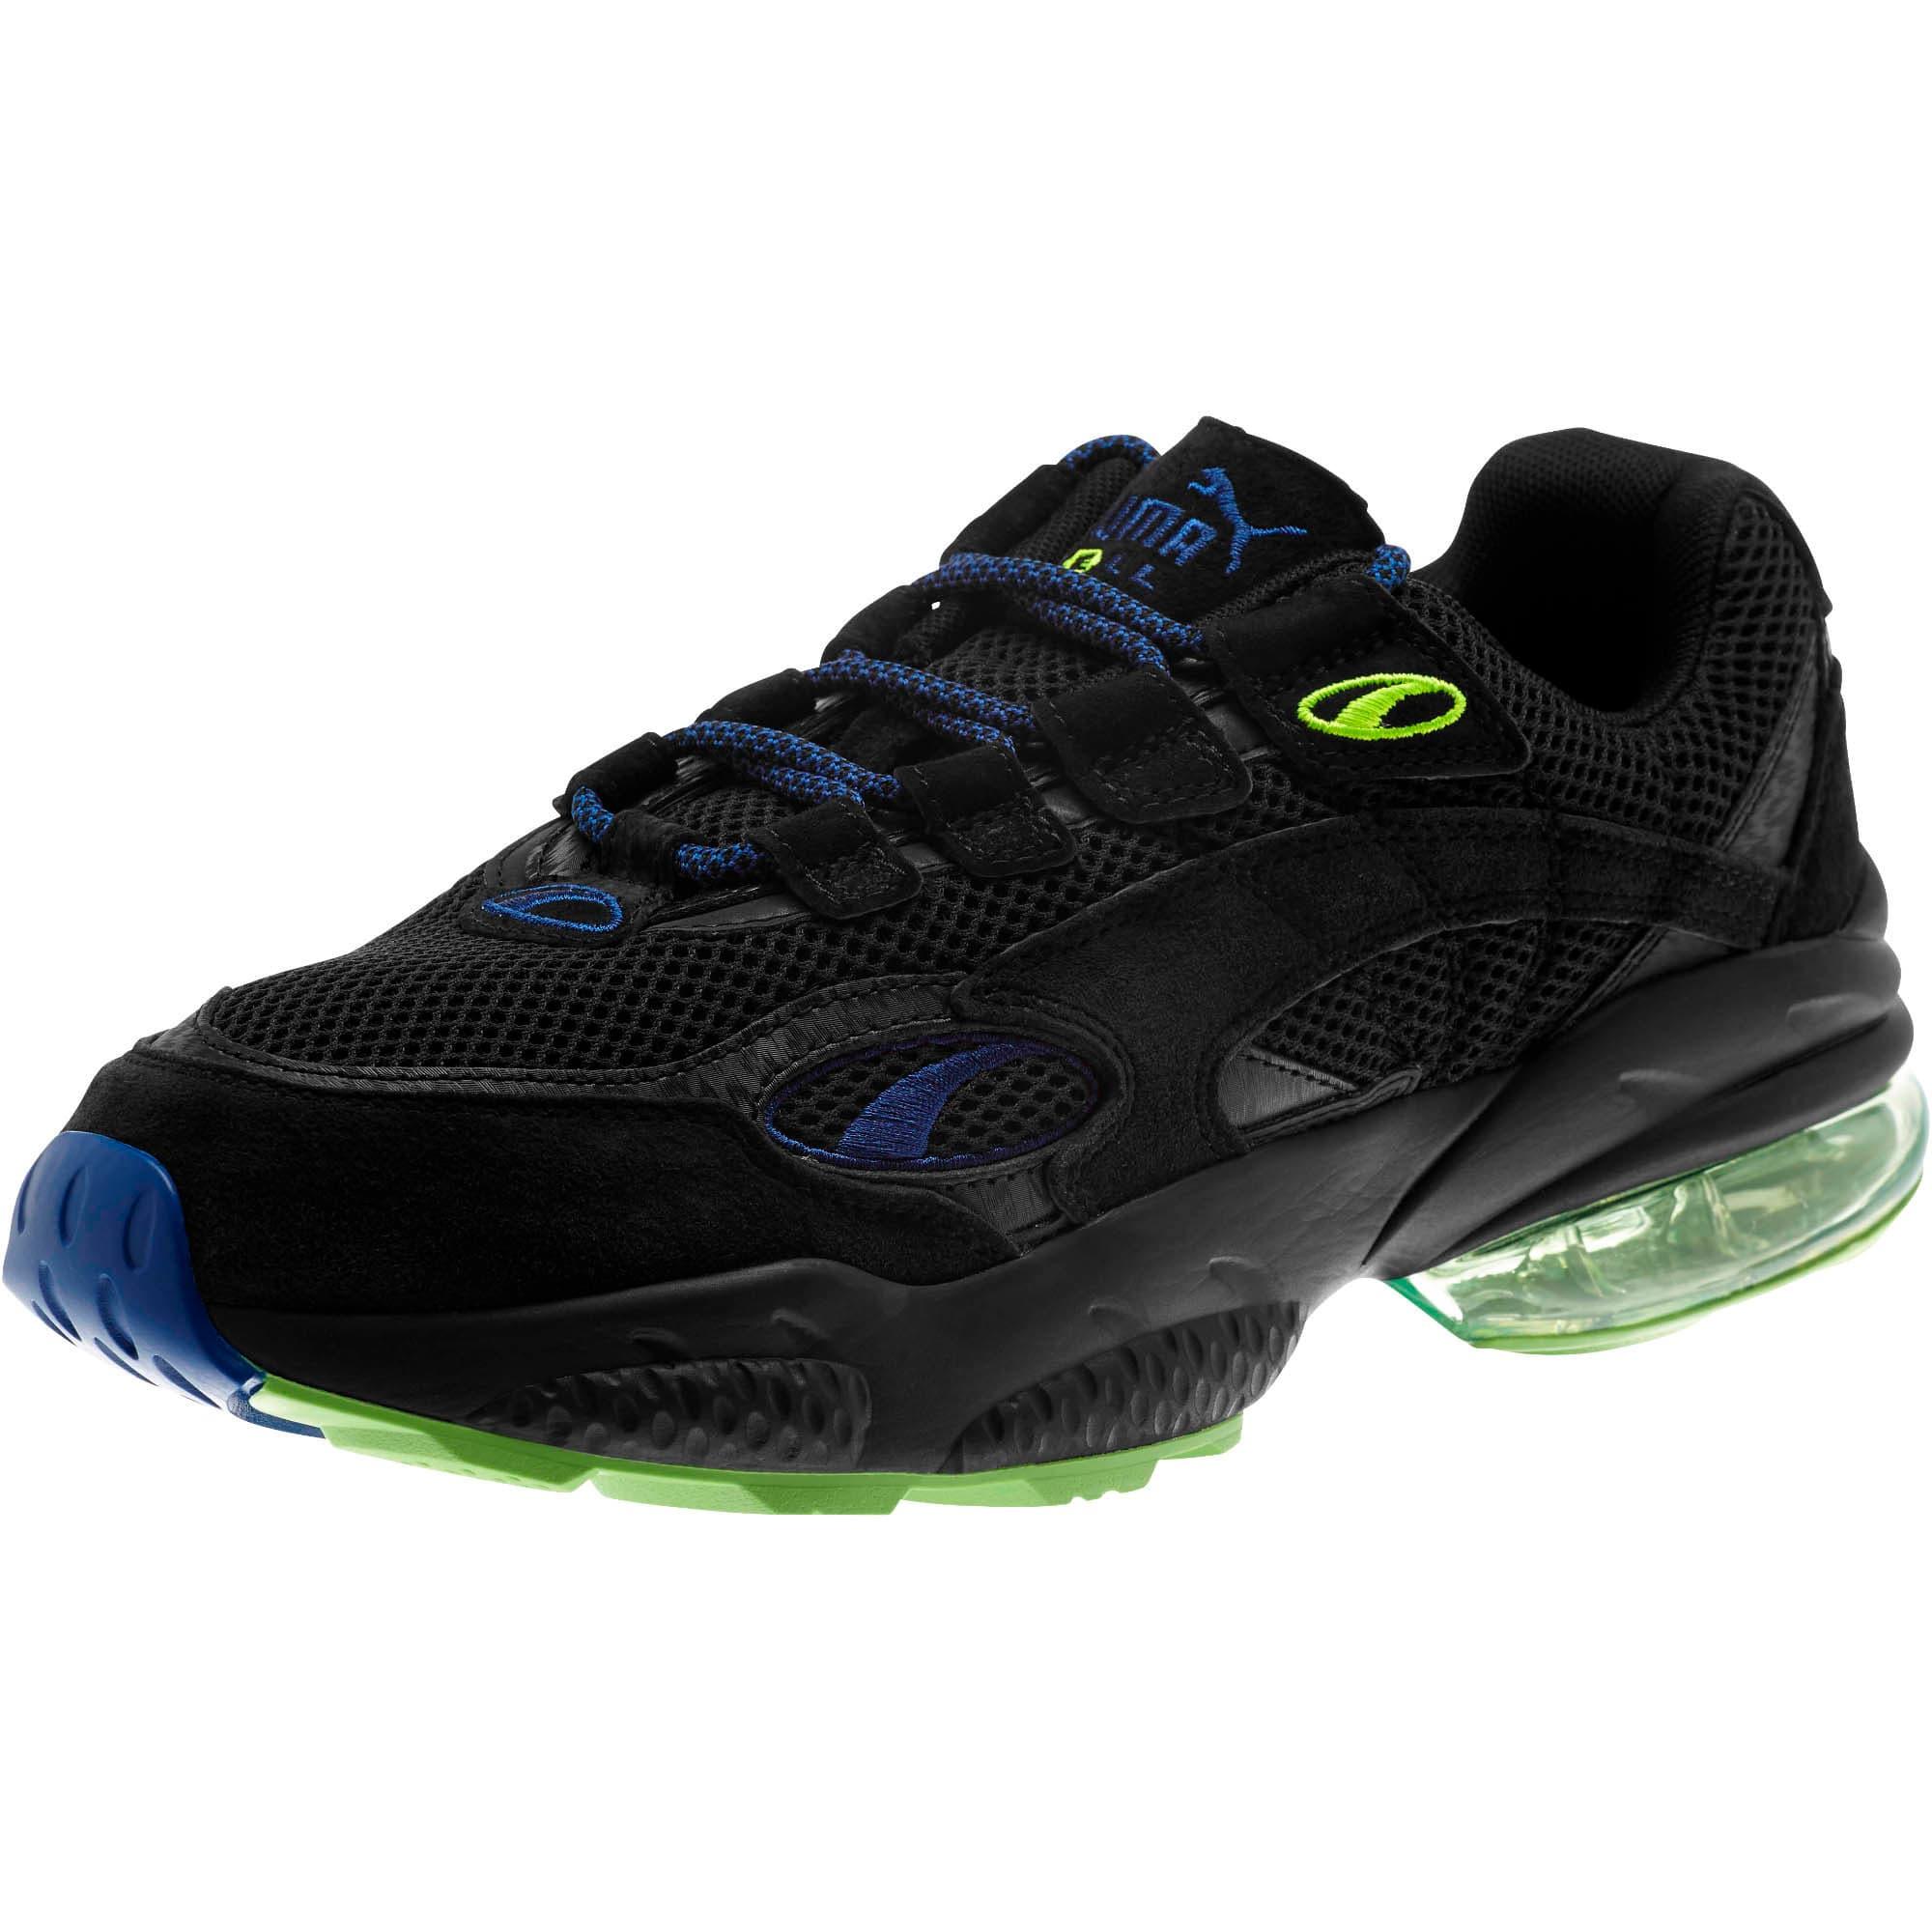 Thumbnail 1 of CELL Venom NV Sneakers, Puma Black-Surf The Web, medium